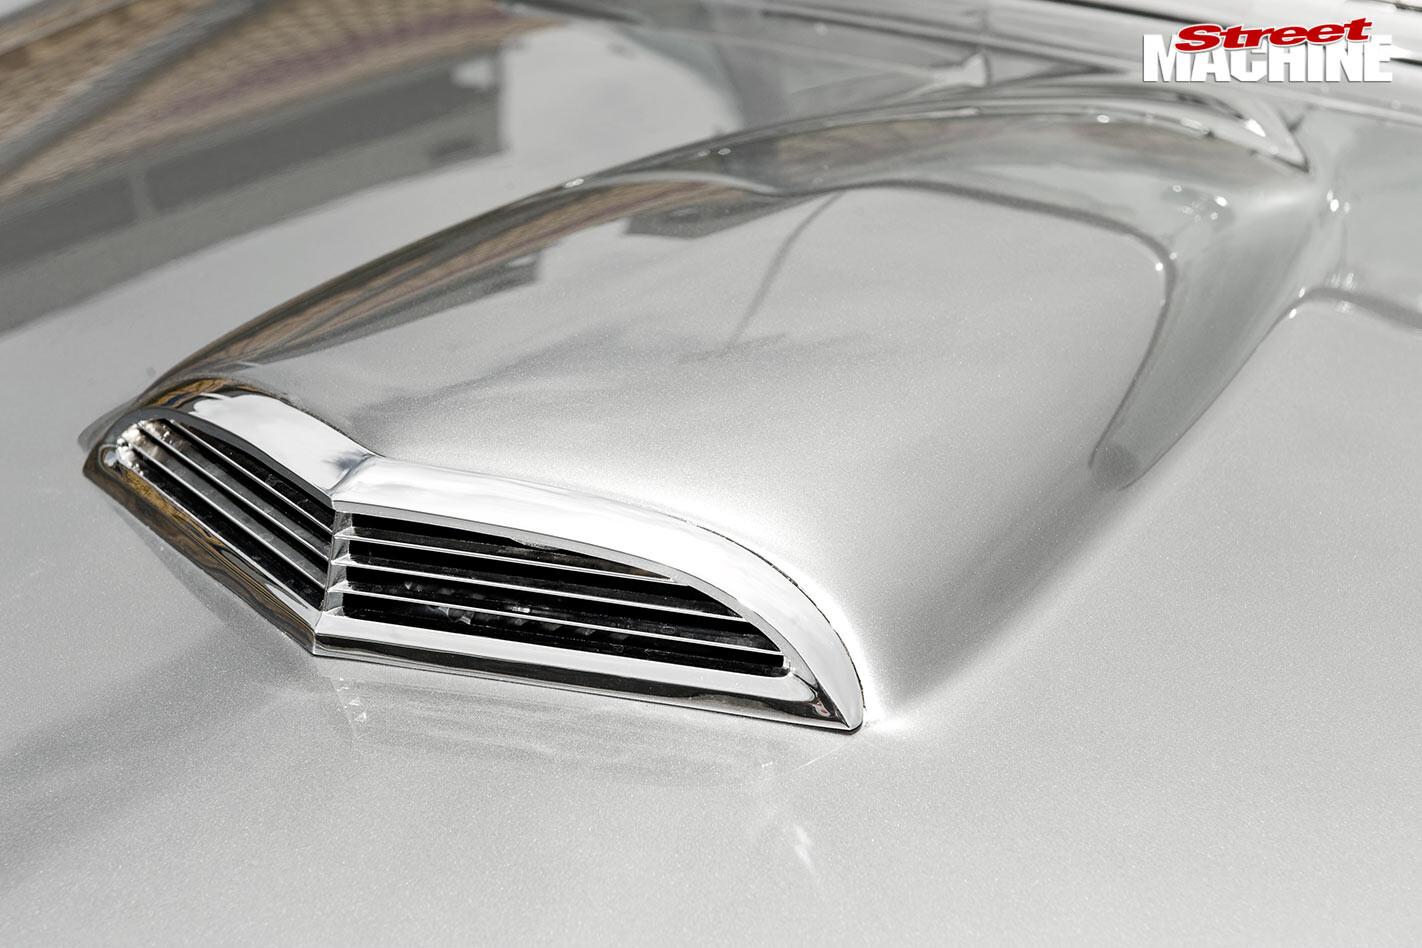 Ford Thunderbird bonnet